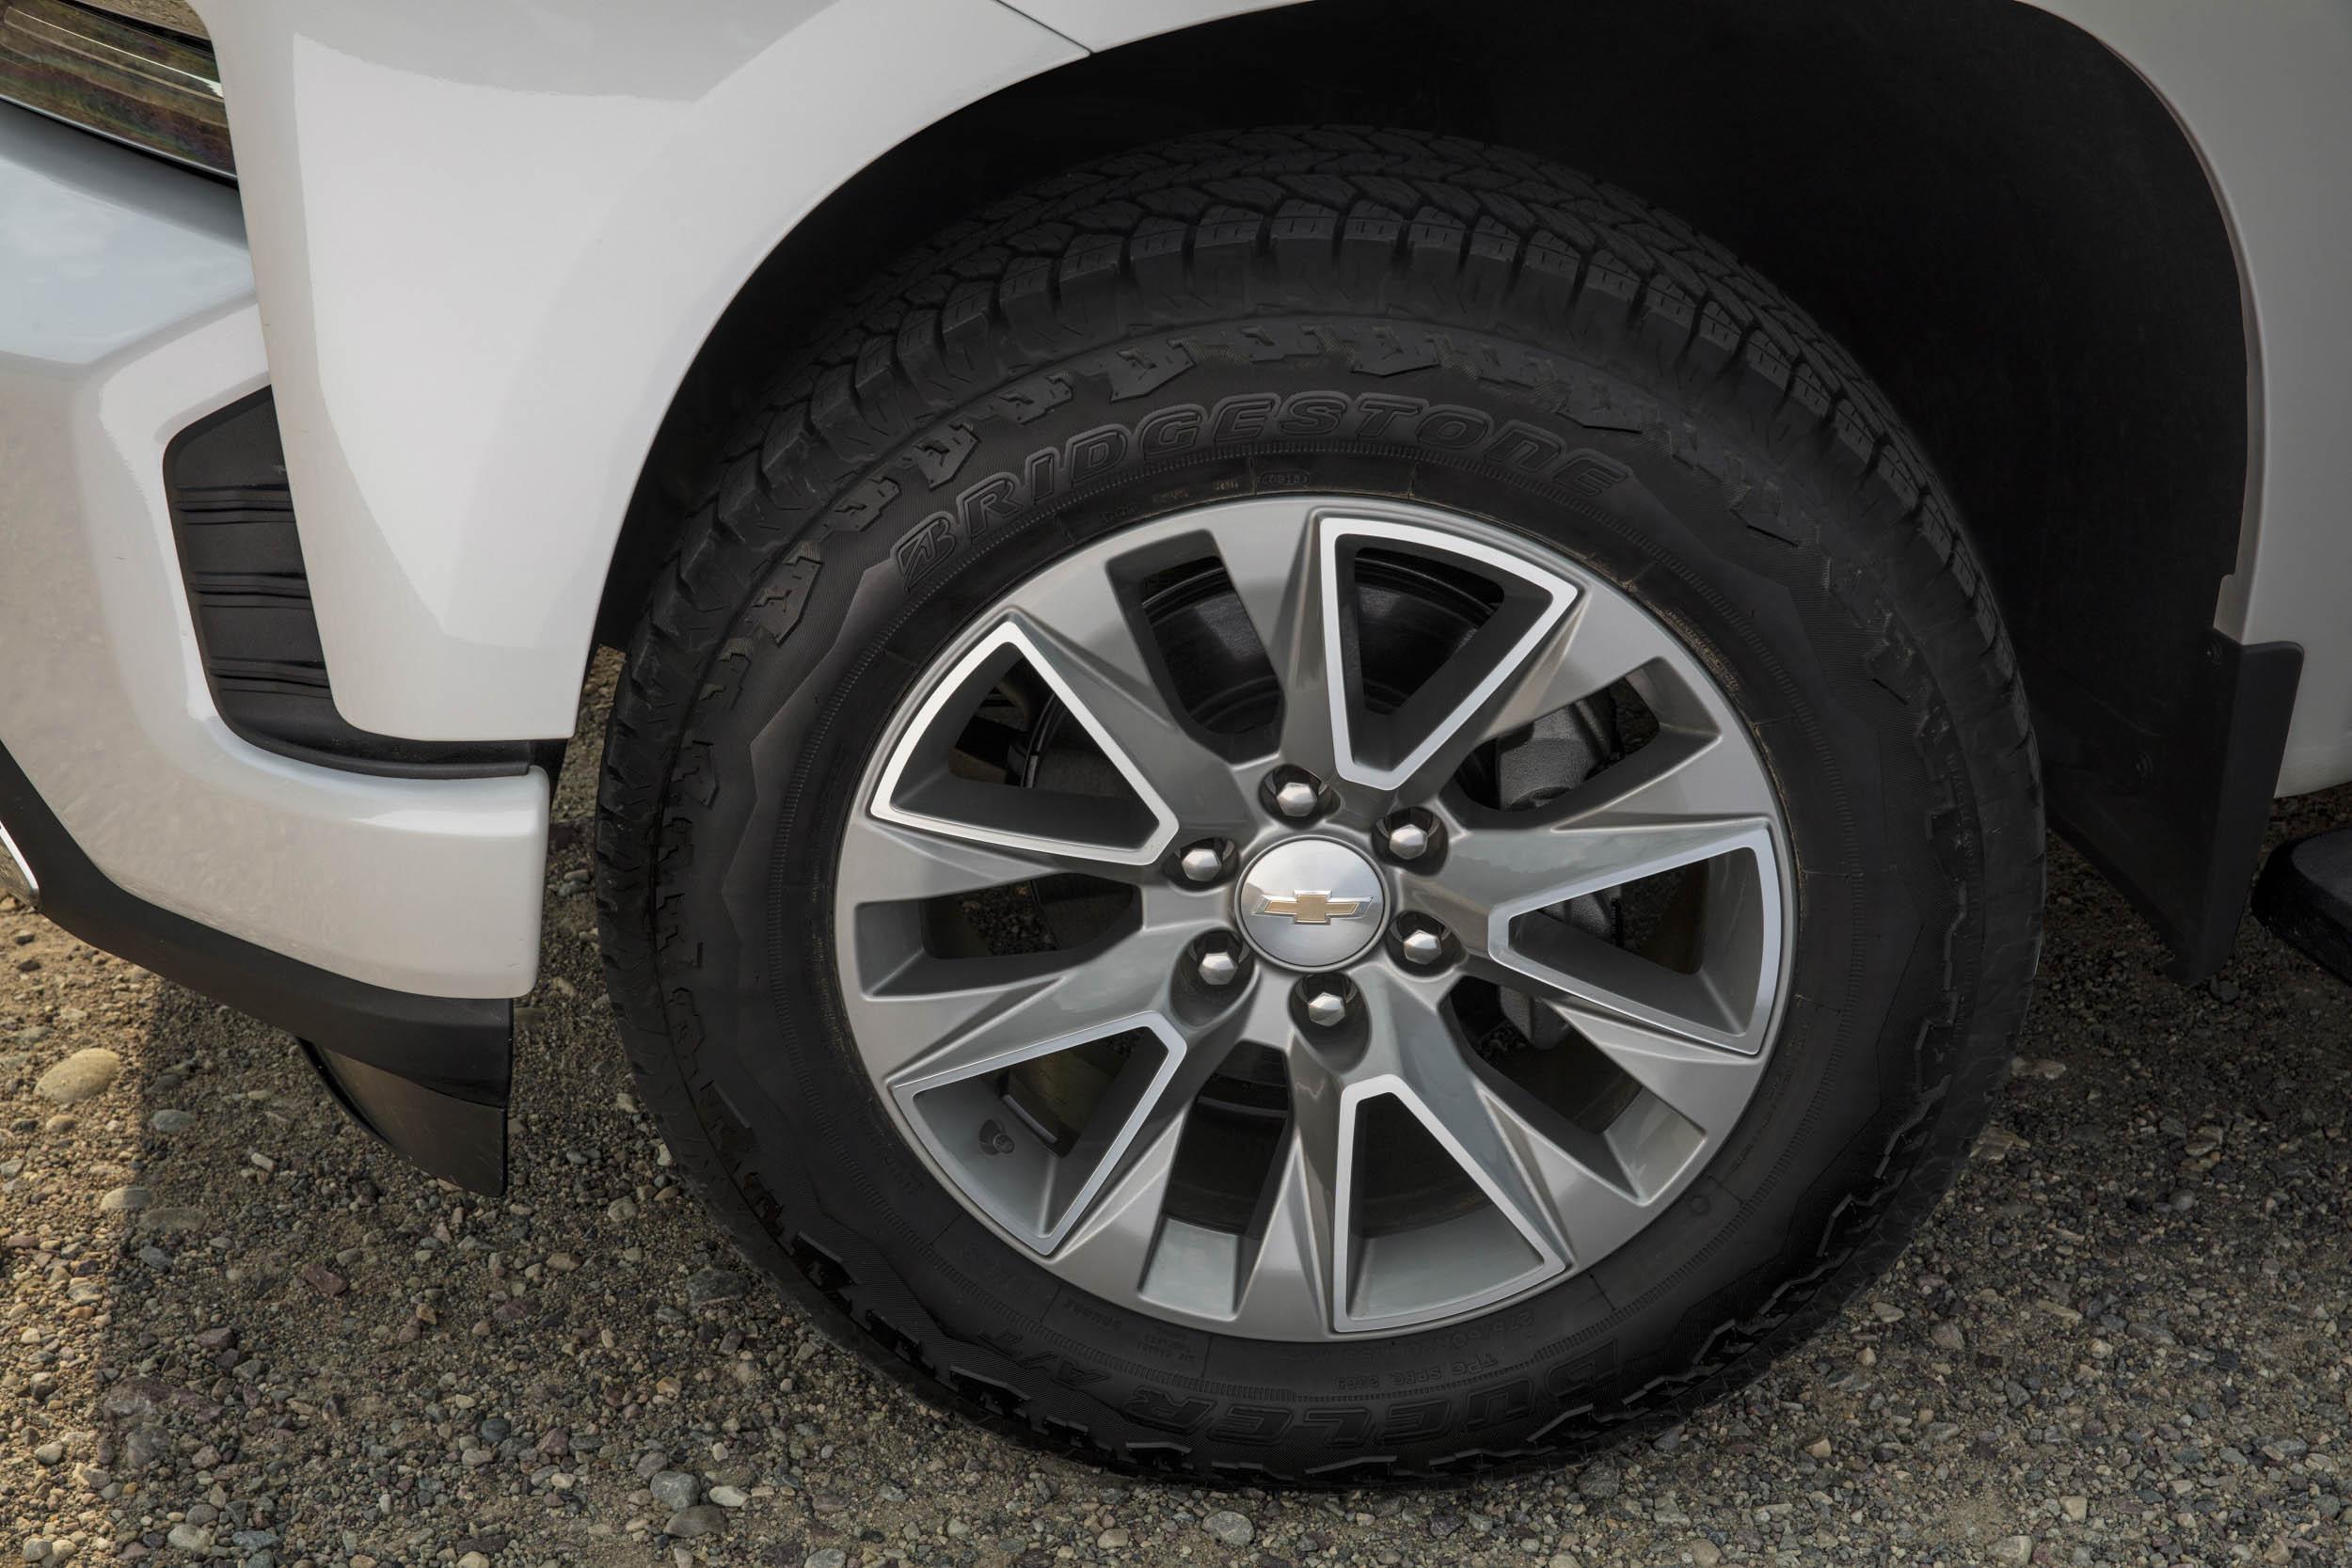 2019 chevrolet silverado high country tire